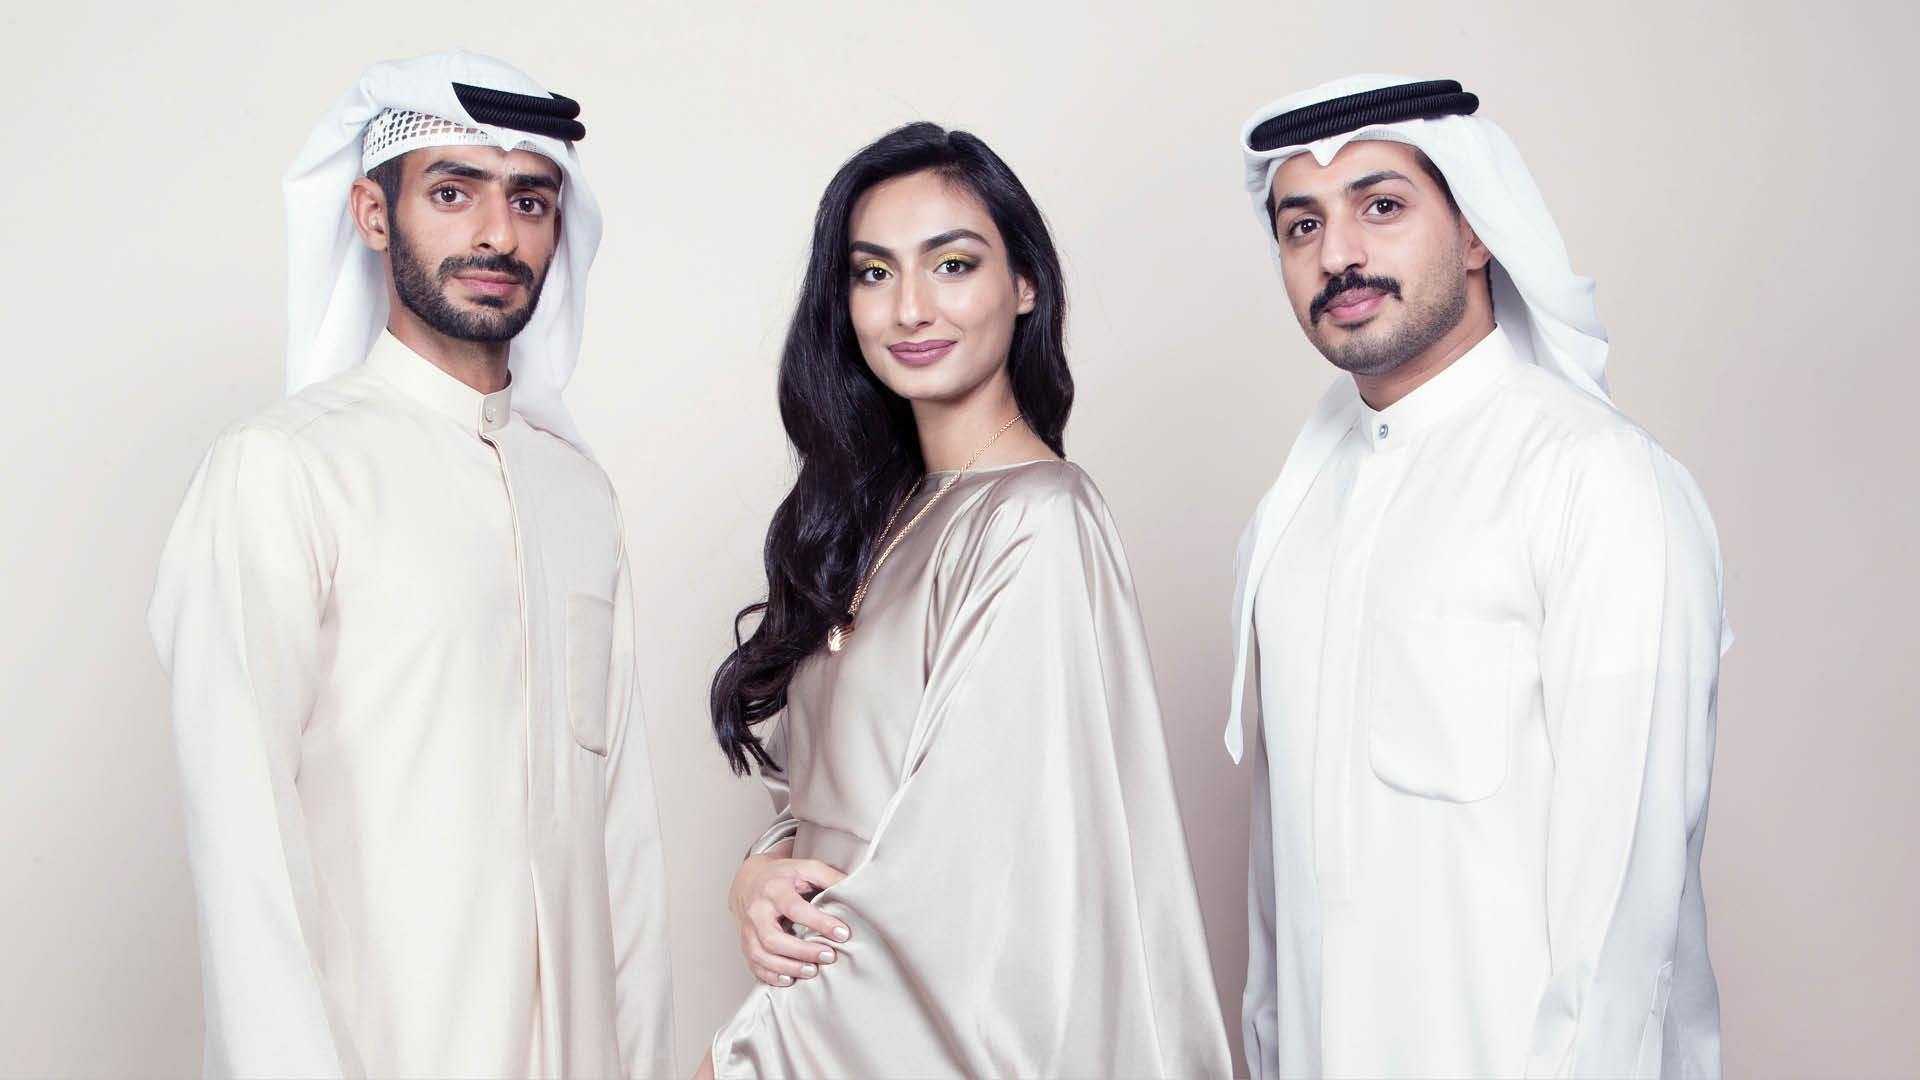 Abdulla BelJafla, Hamad bin Shaiban and Bushra bint Darwish